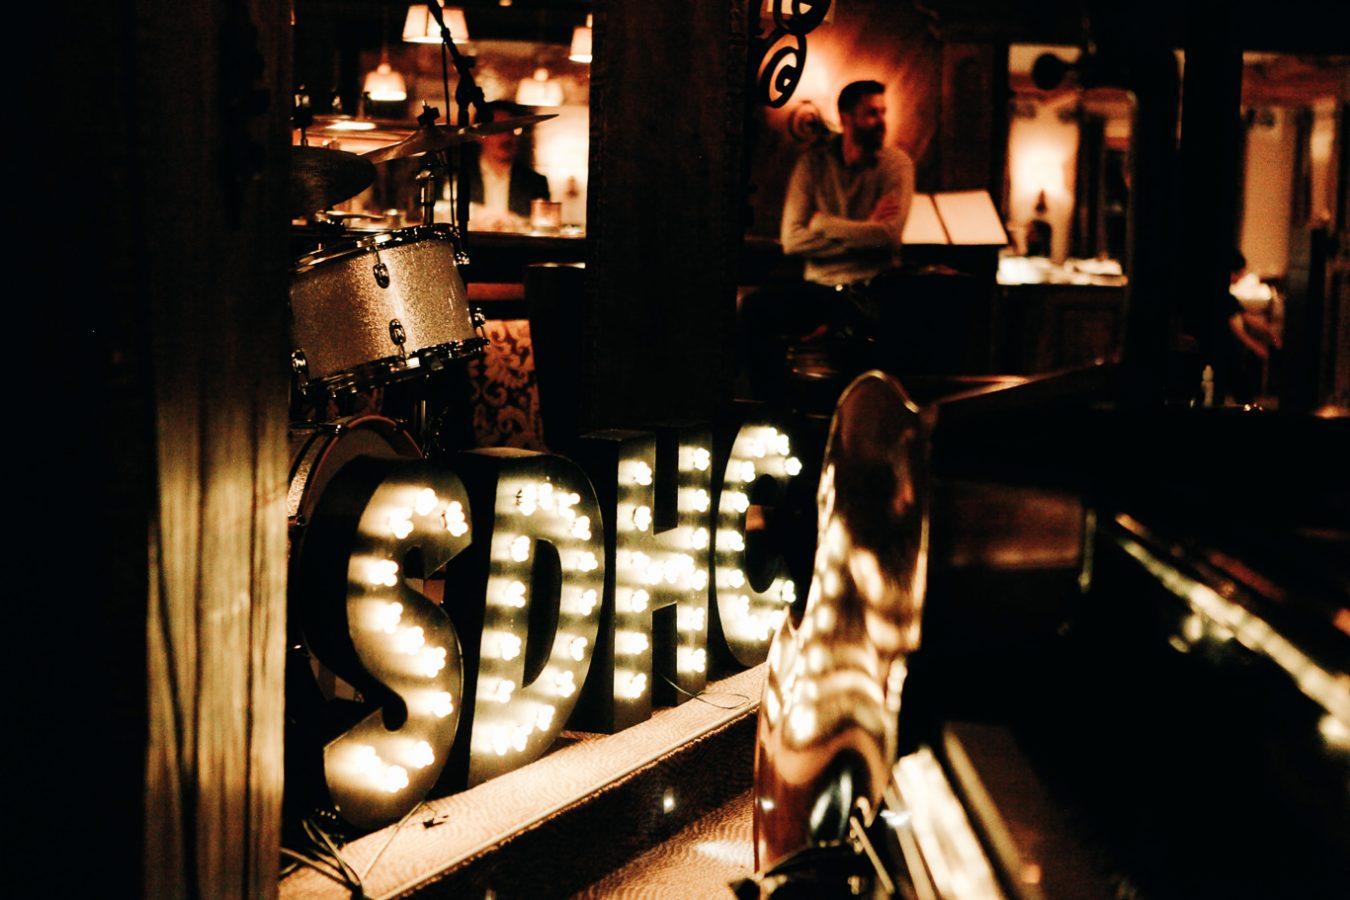 SDHC Tanzcafe